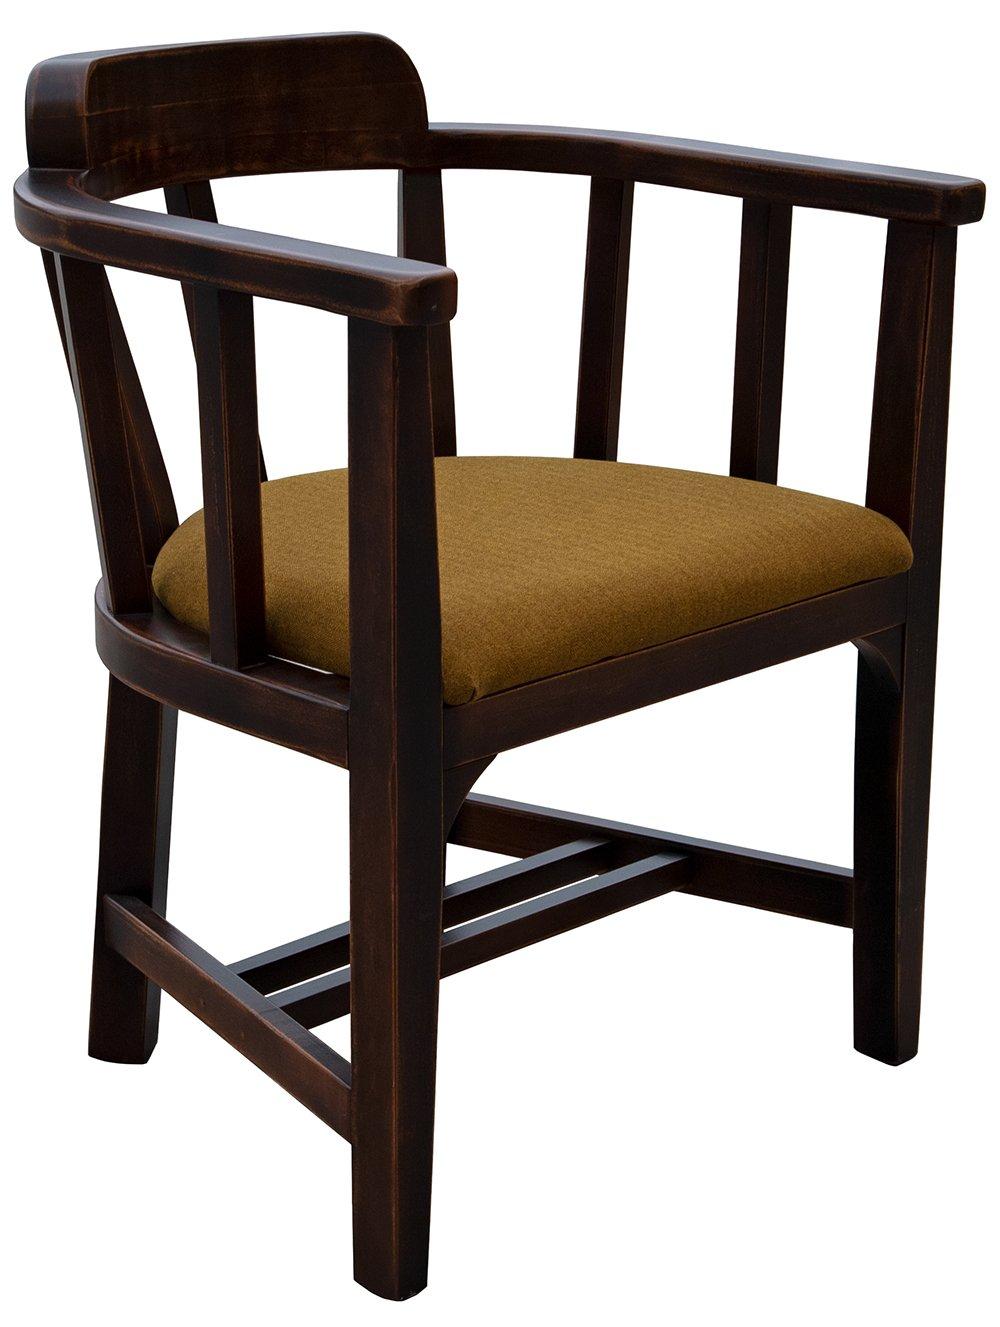 Steam Armchair